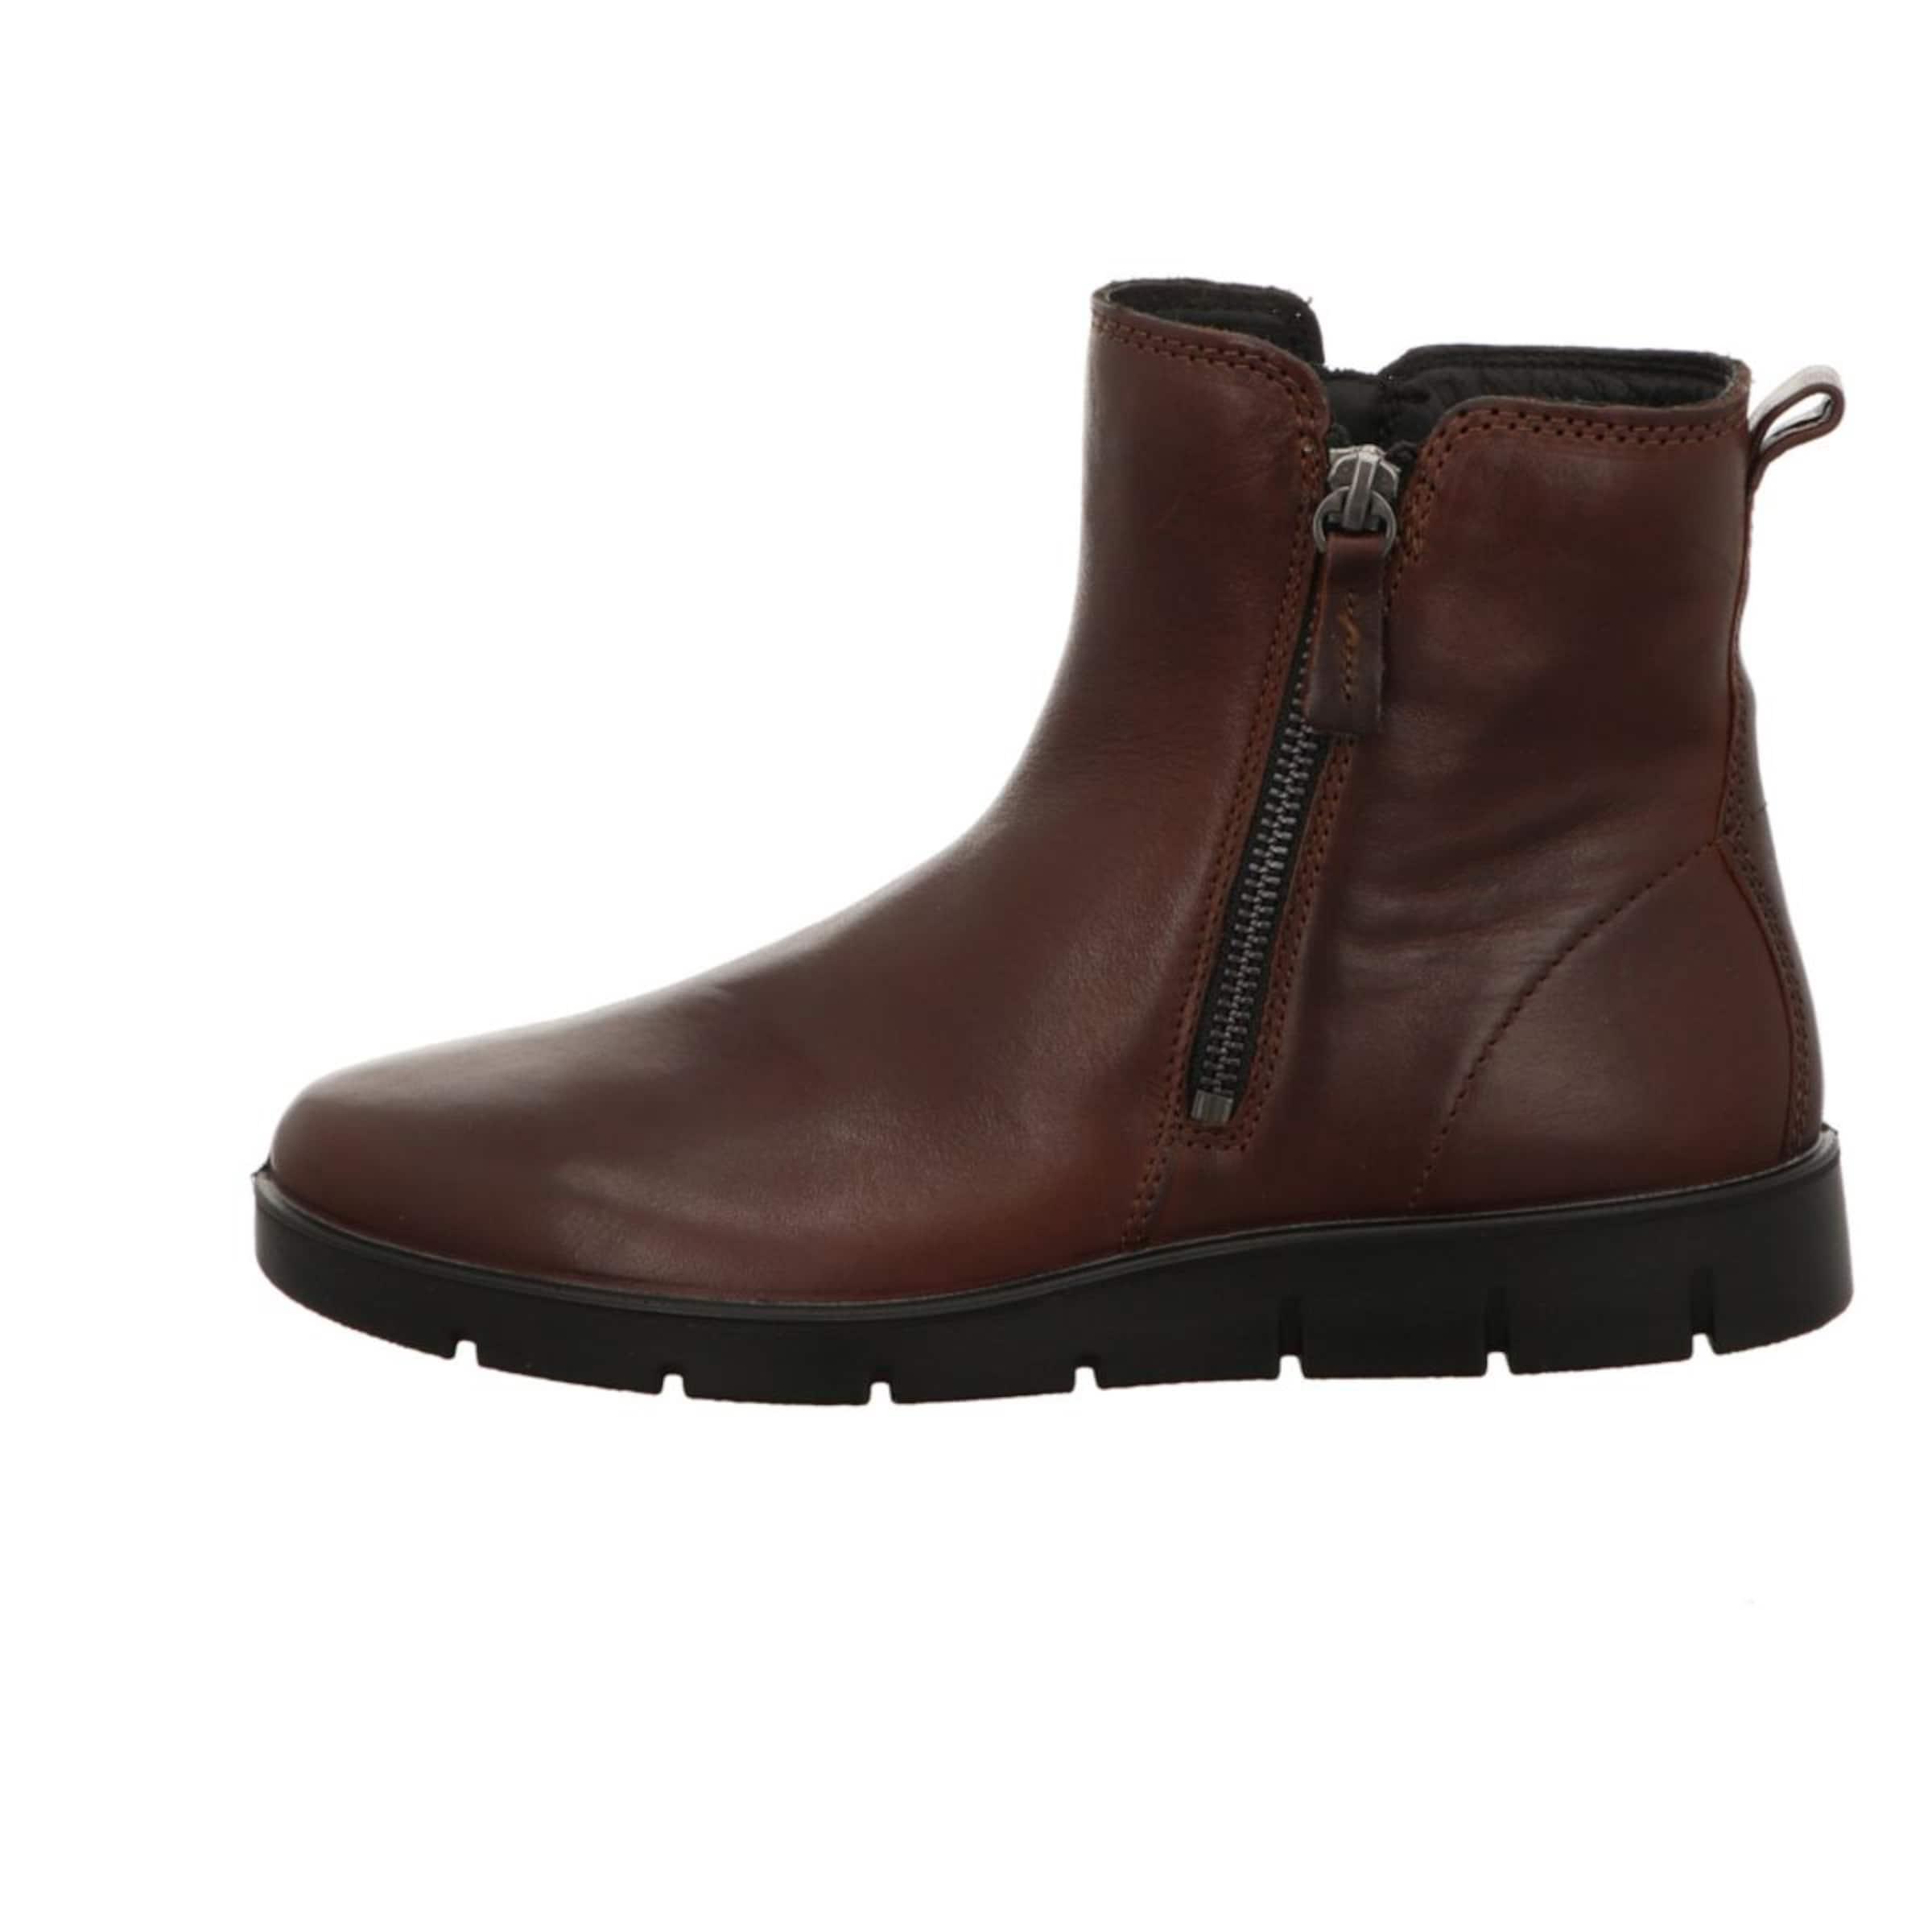 Braun Ecco Stiefel Stiefel In Ecco 8PnkNwX0OZ